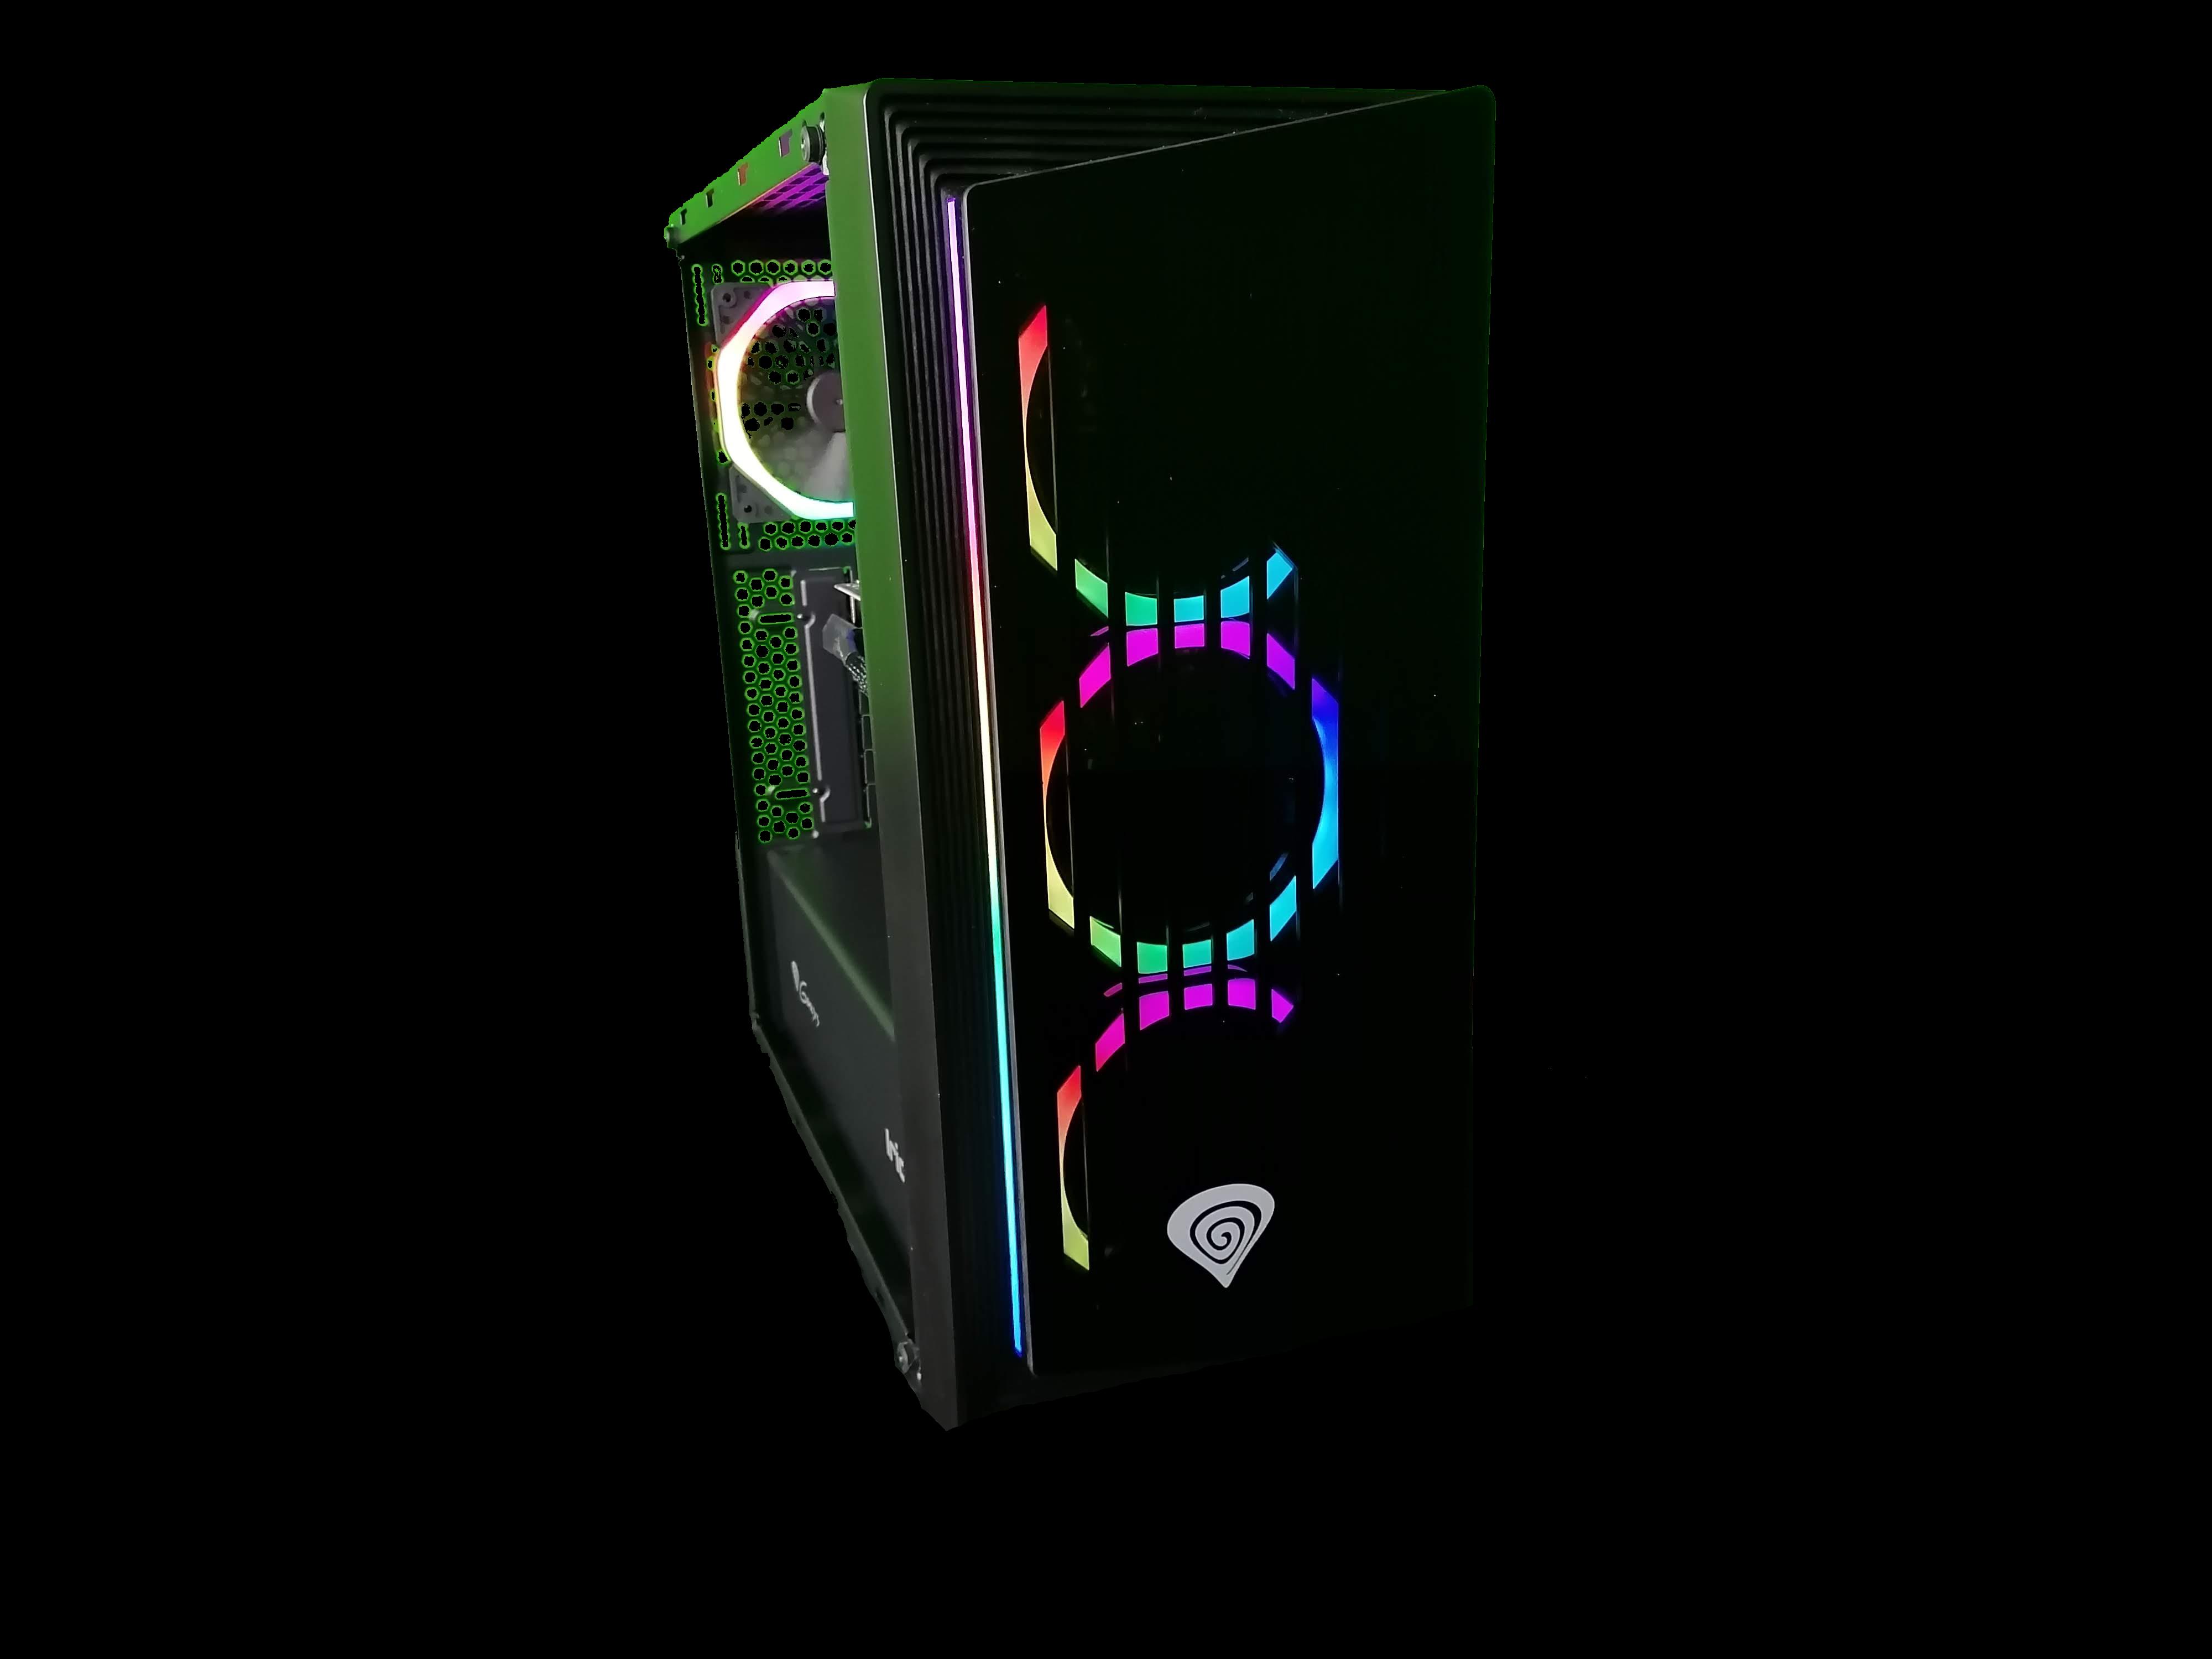 X-DIABLO Gamer R5 2060 RGB (R5 3600/16GB/SSD 1000GB NVME/RTX2060 6GB/W10) - 11552611